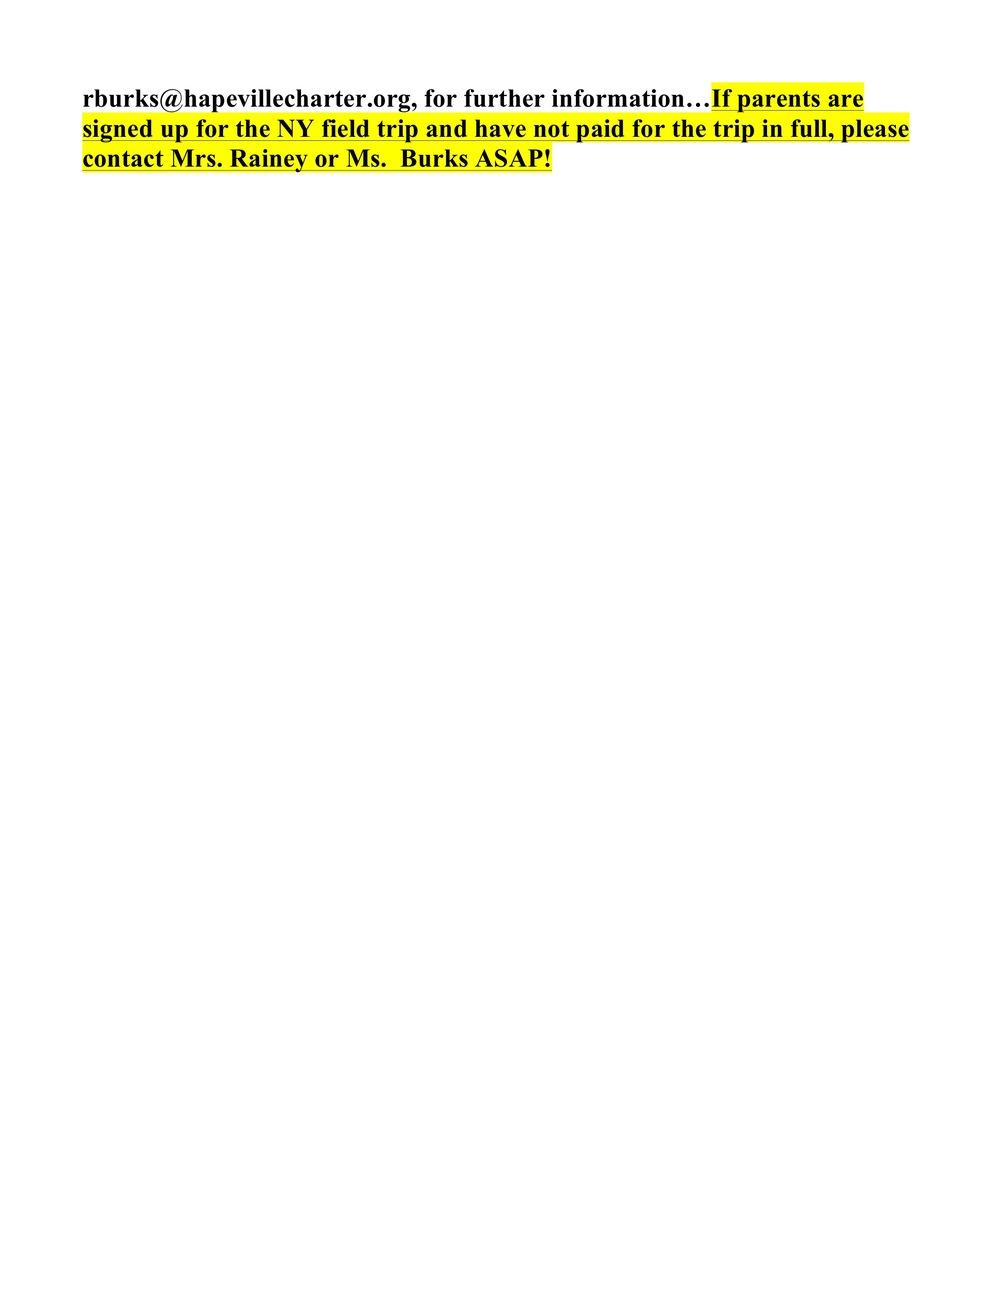 Newsletter Image7th grade January 26, 2015 5.jpeg